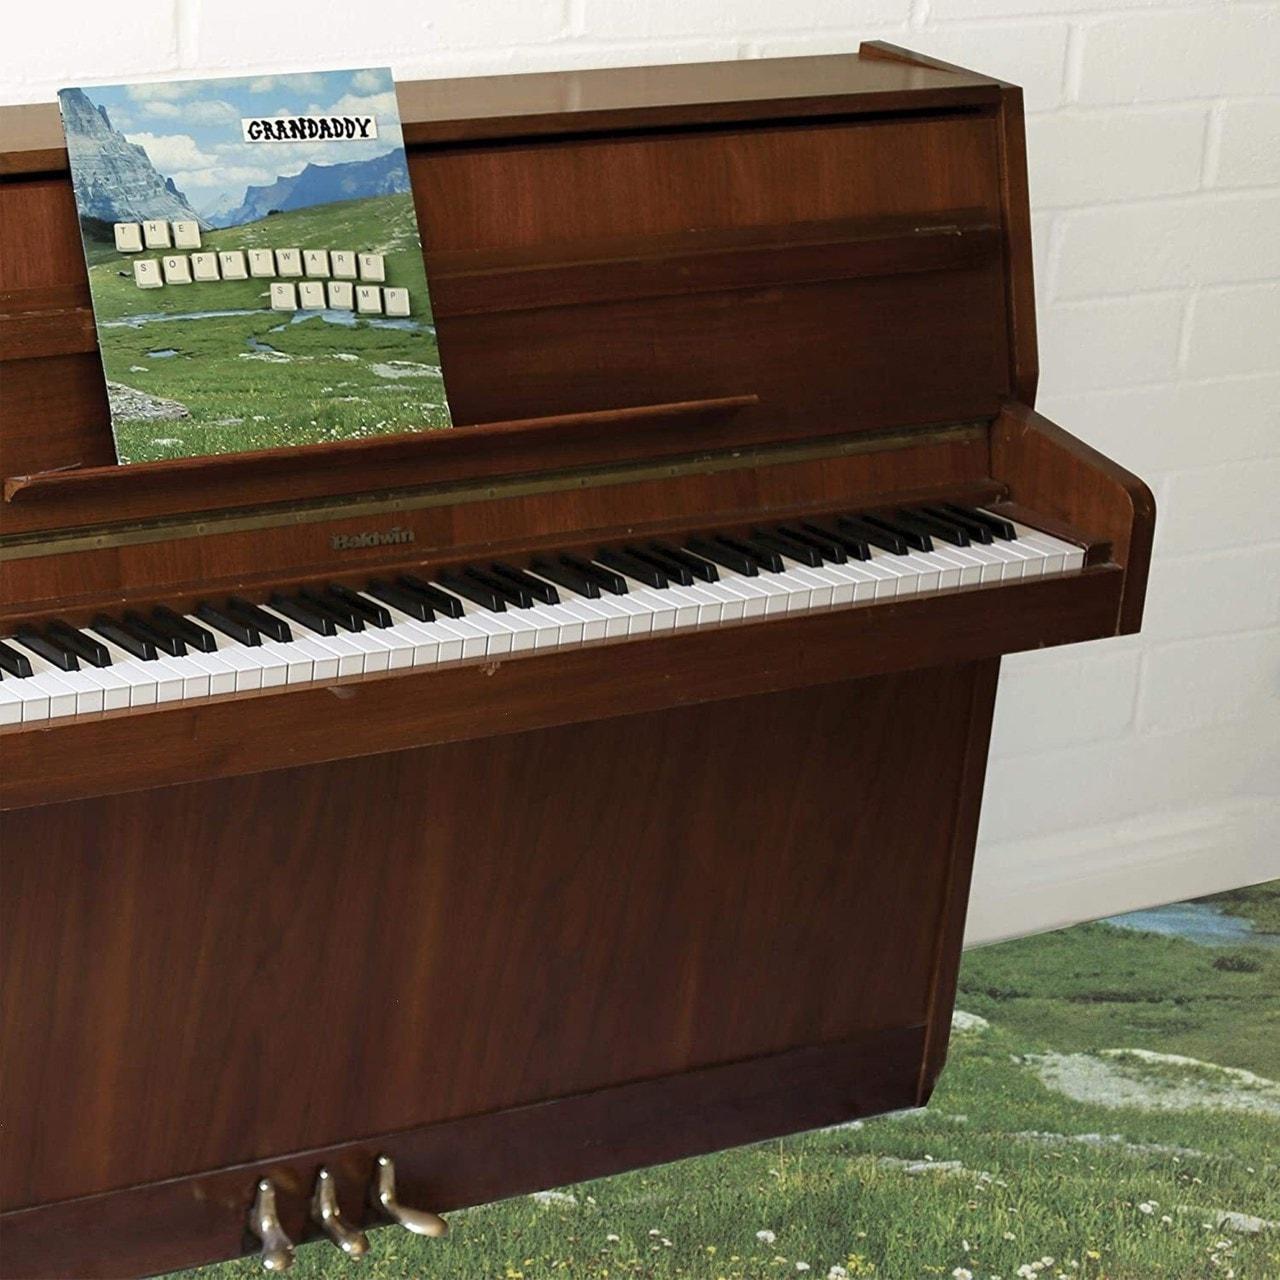 The Sophtware Slump... On a Wooden Piano - 1